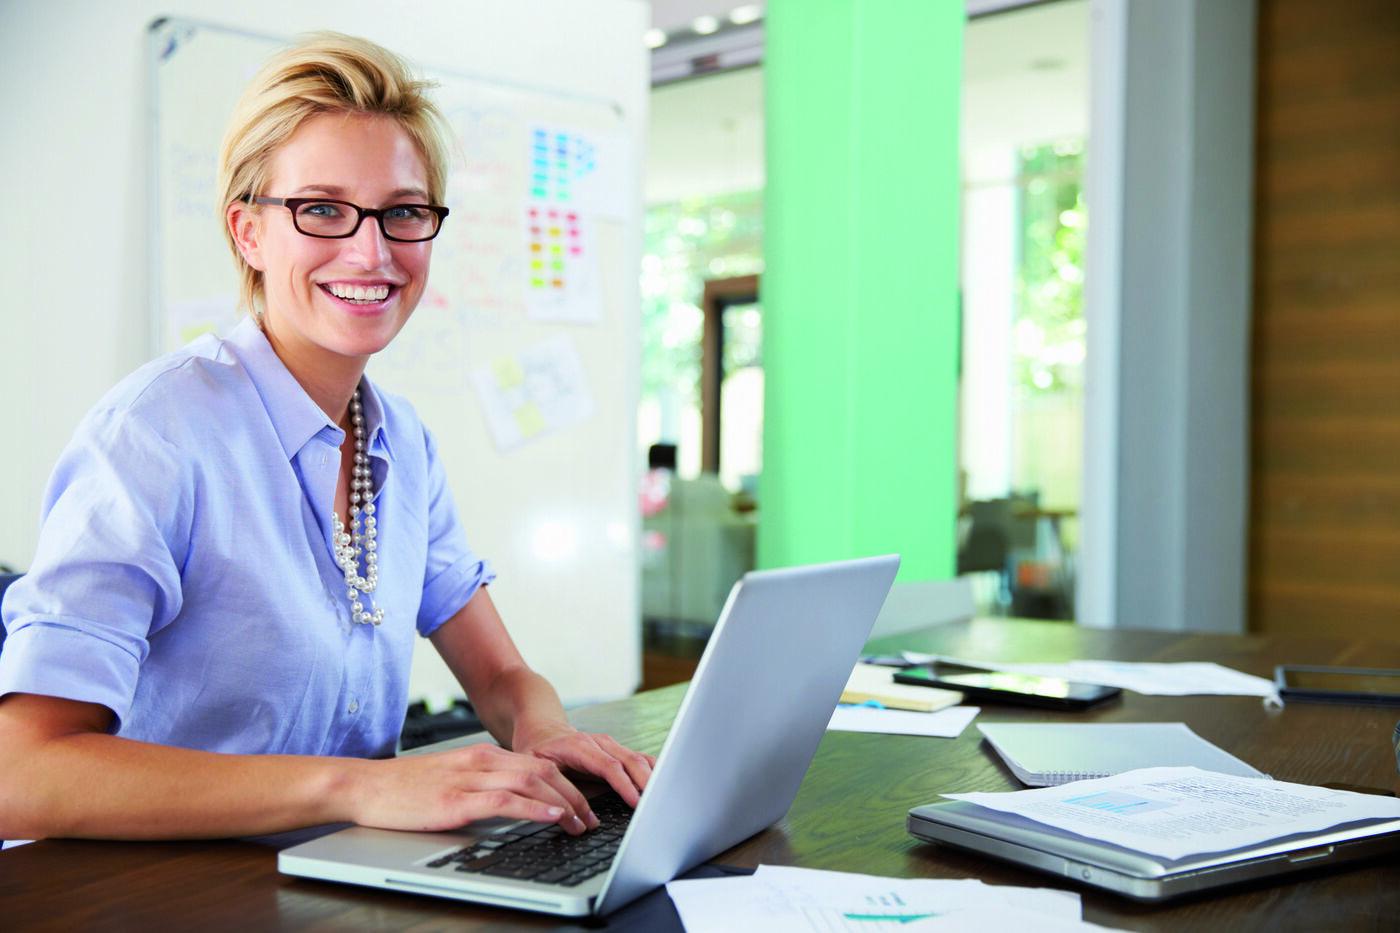 Assistent / Referent der Geschäftsführung / strategische Projekte (w/m/d) - Job München - Stellenportal SHL Familie